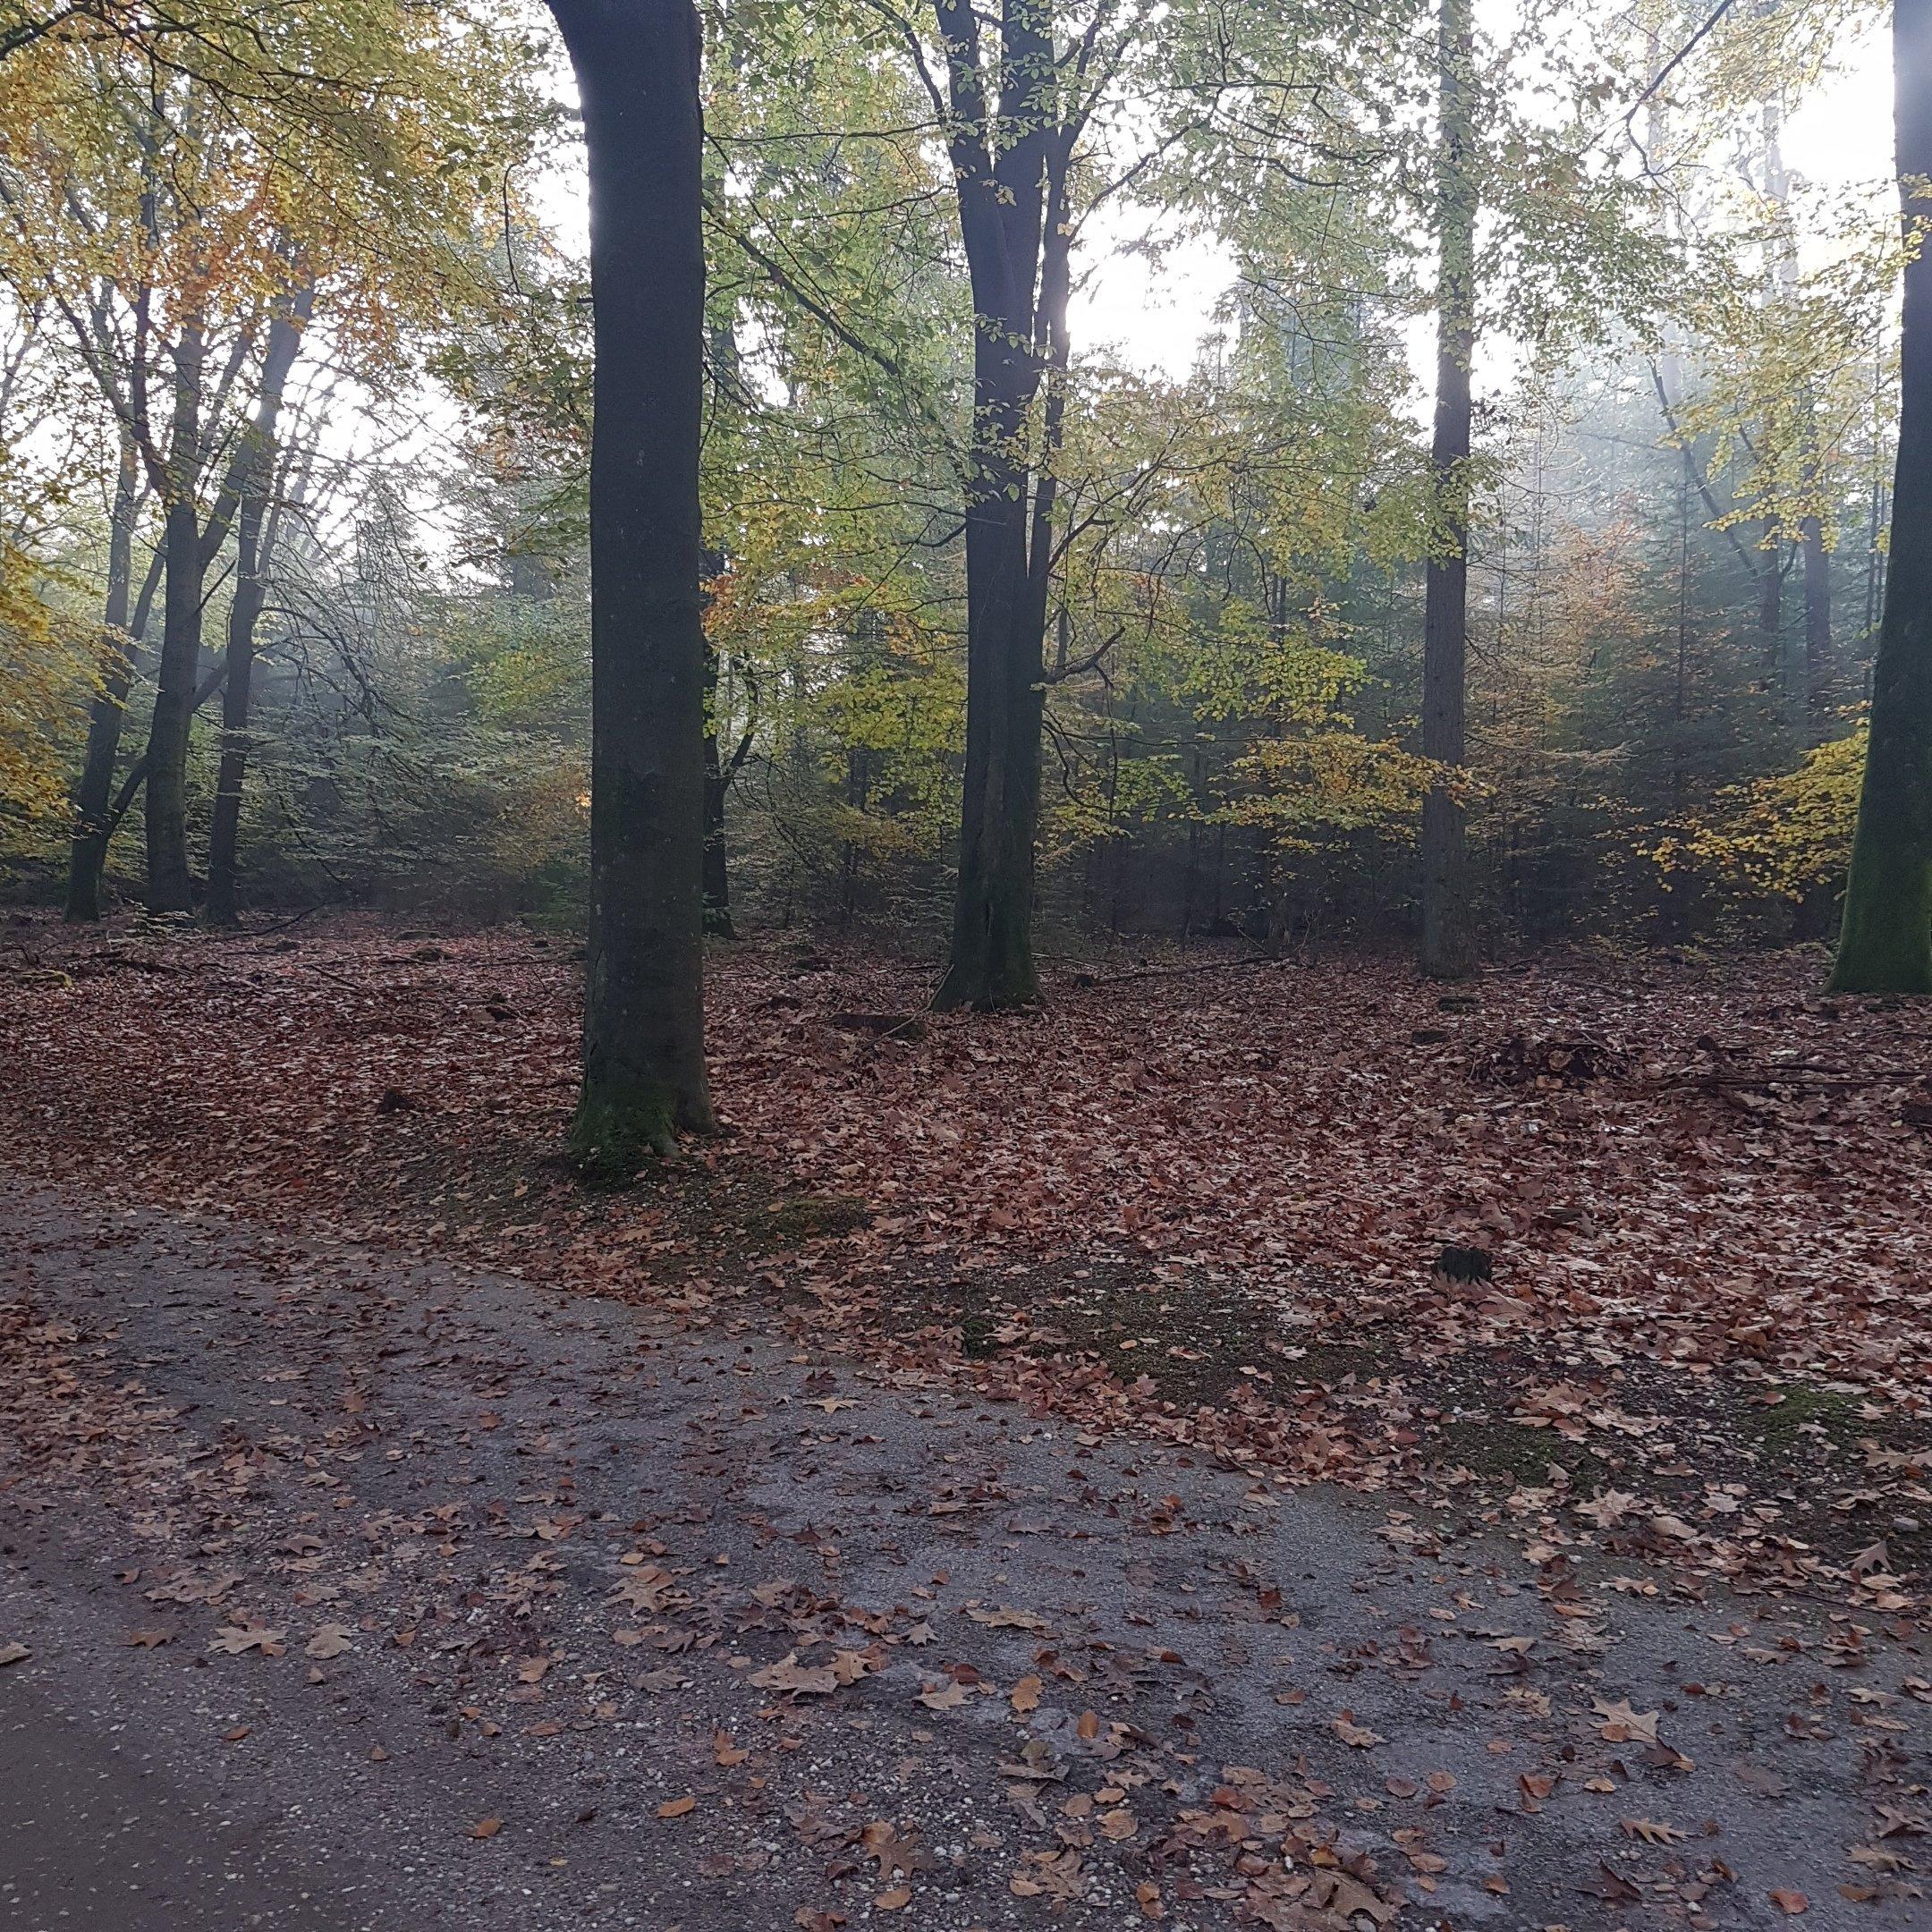 The autumn scenery in Veluwe 2 - itstartswithacoffee.com #geocache #geocaching #geocachingNL #geocachingNetherlands #geocachingfun #Veluwe